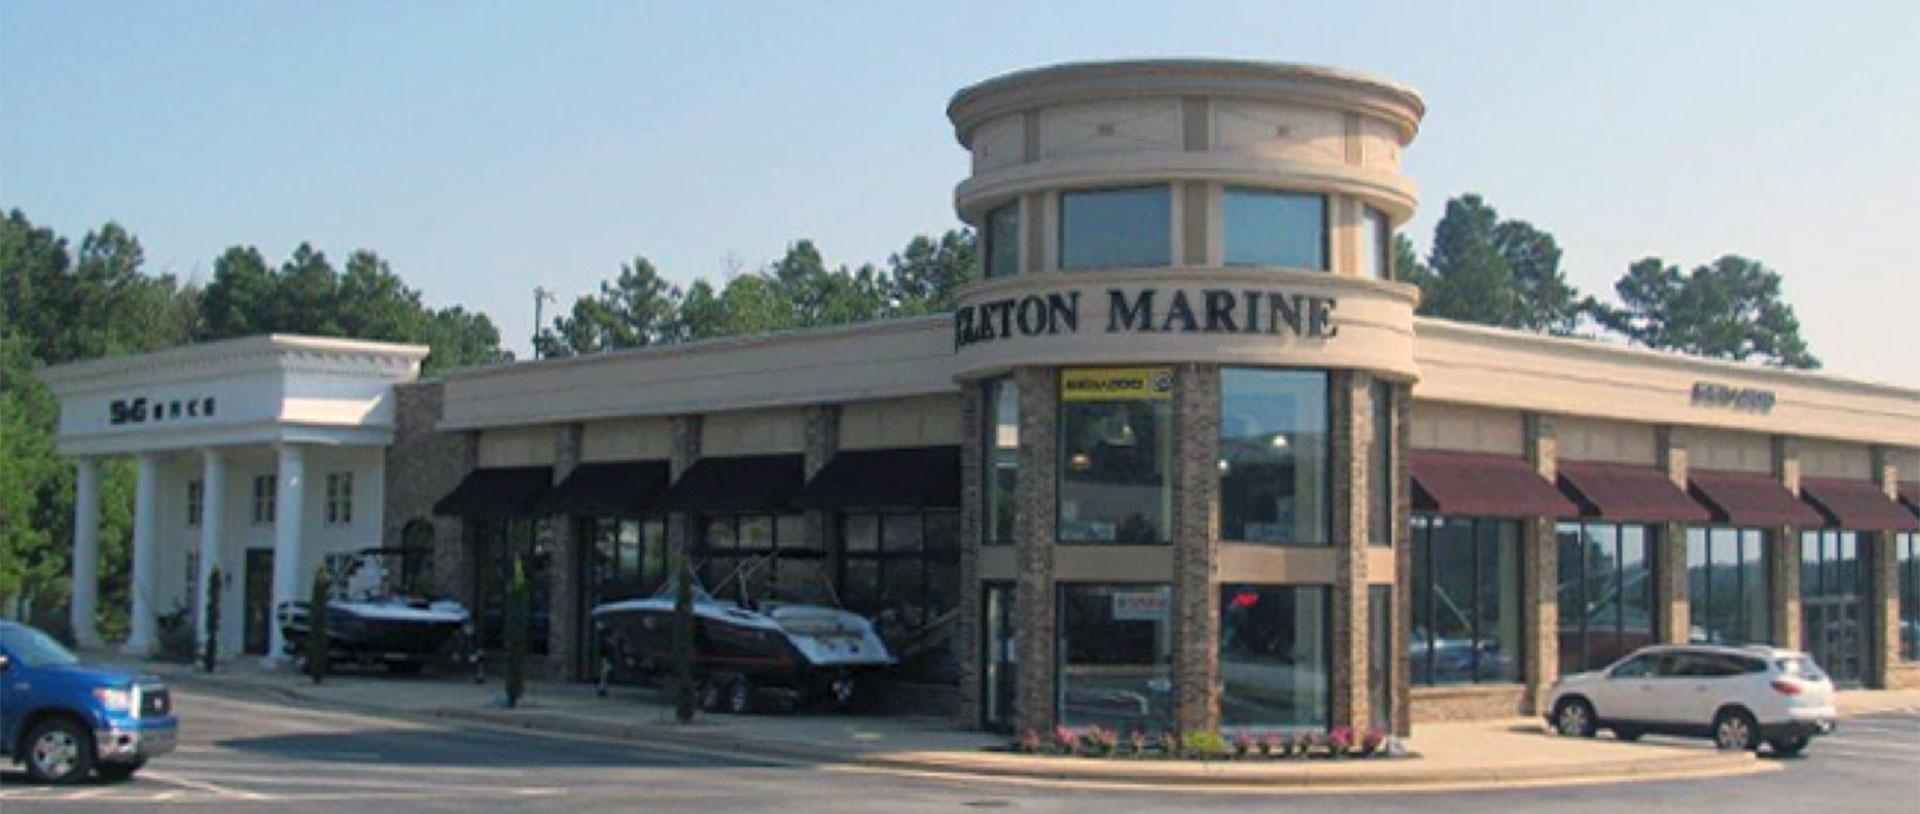 Singleton Marine Group - Lake Oconee